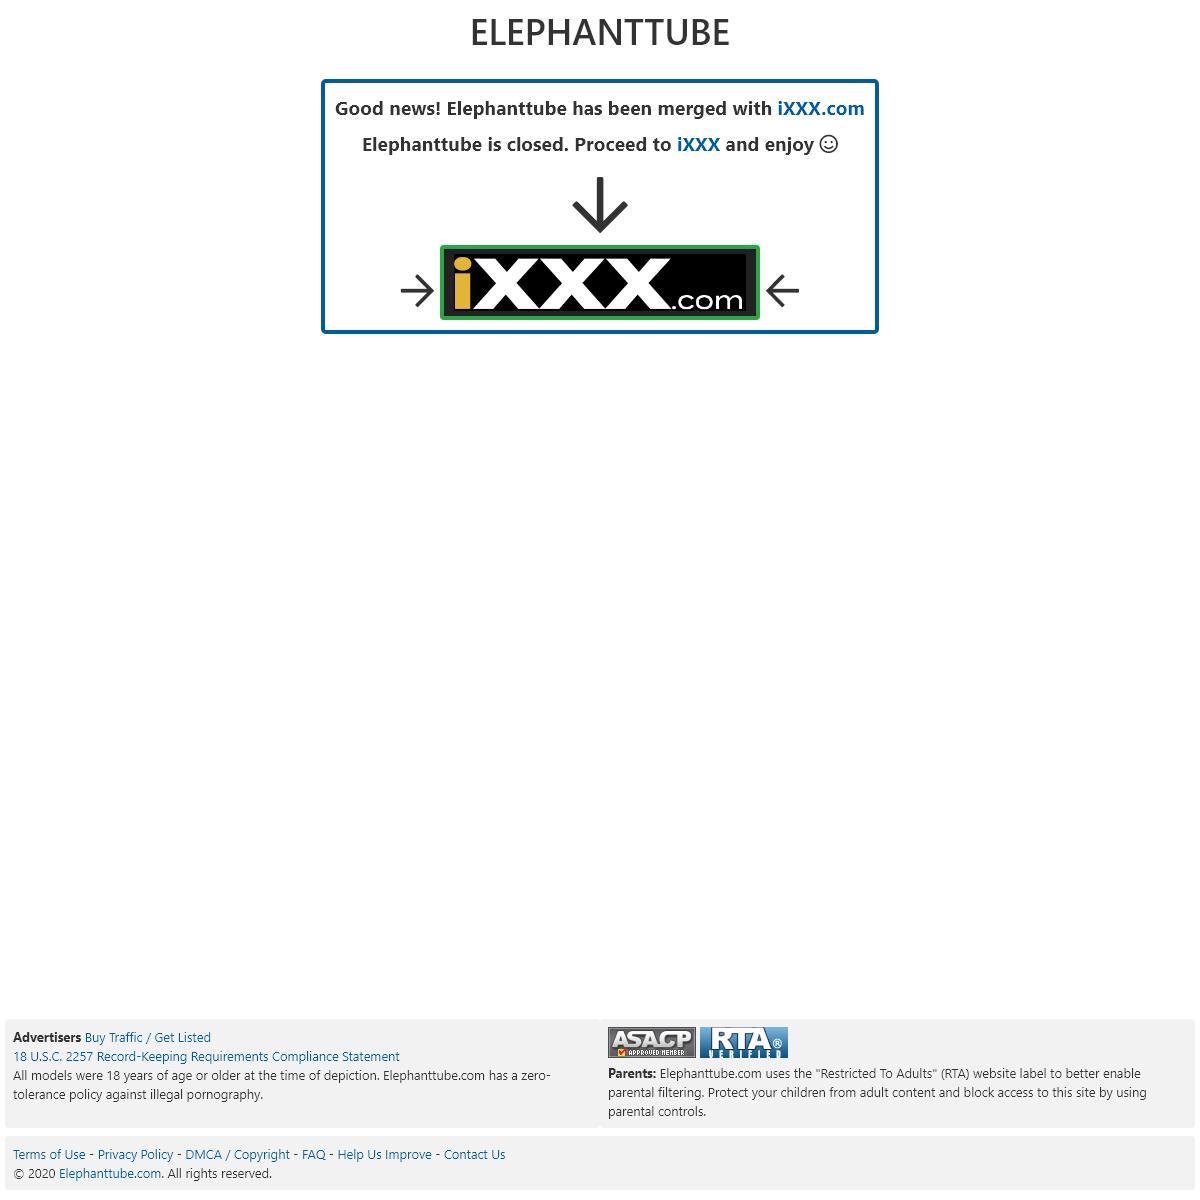 A complete backup of www.elephanttube.com